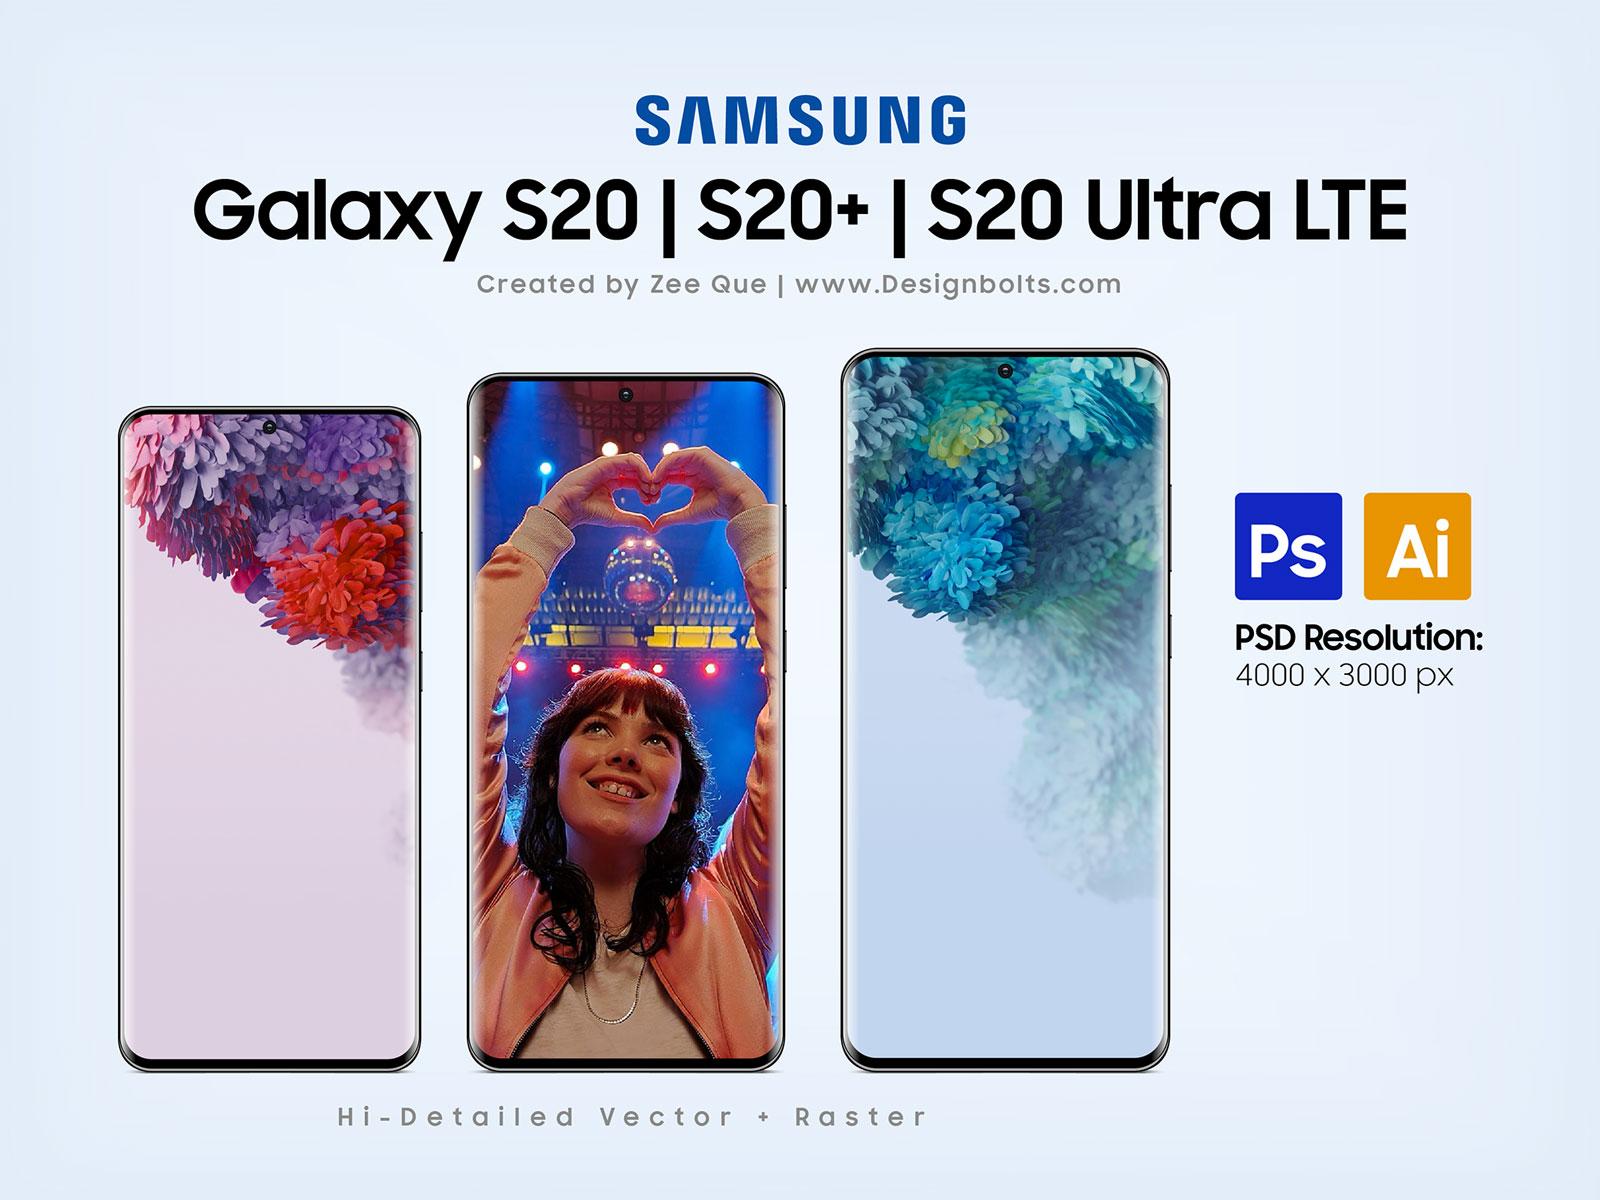 Samsung-Galaxy-S20-S20+-S20-Ultra-LTE-01-01